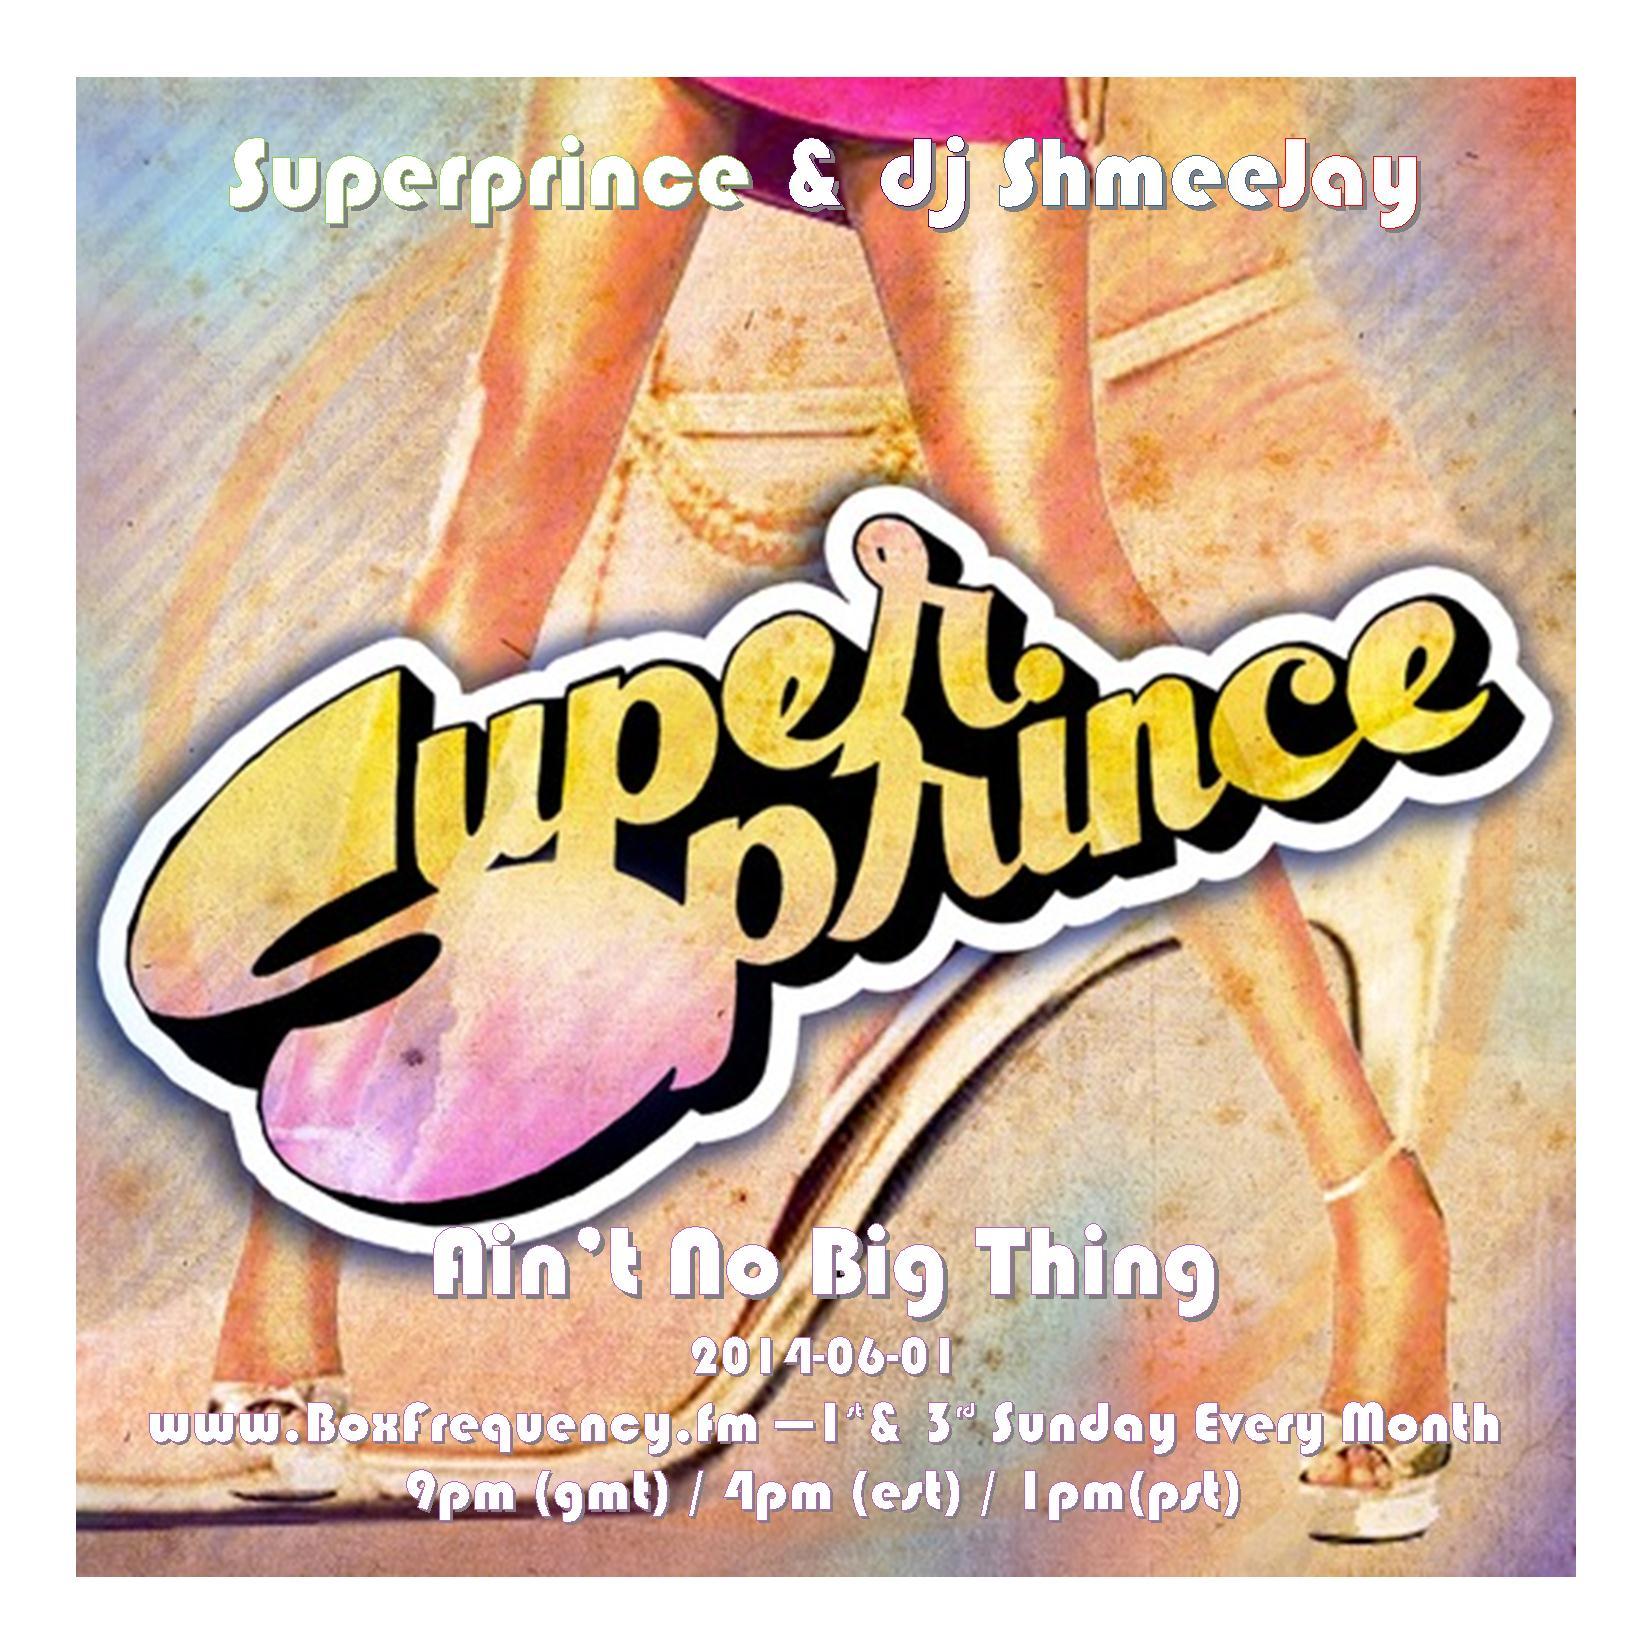 Superprince_Ain't No Big Thing-Freq